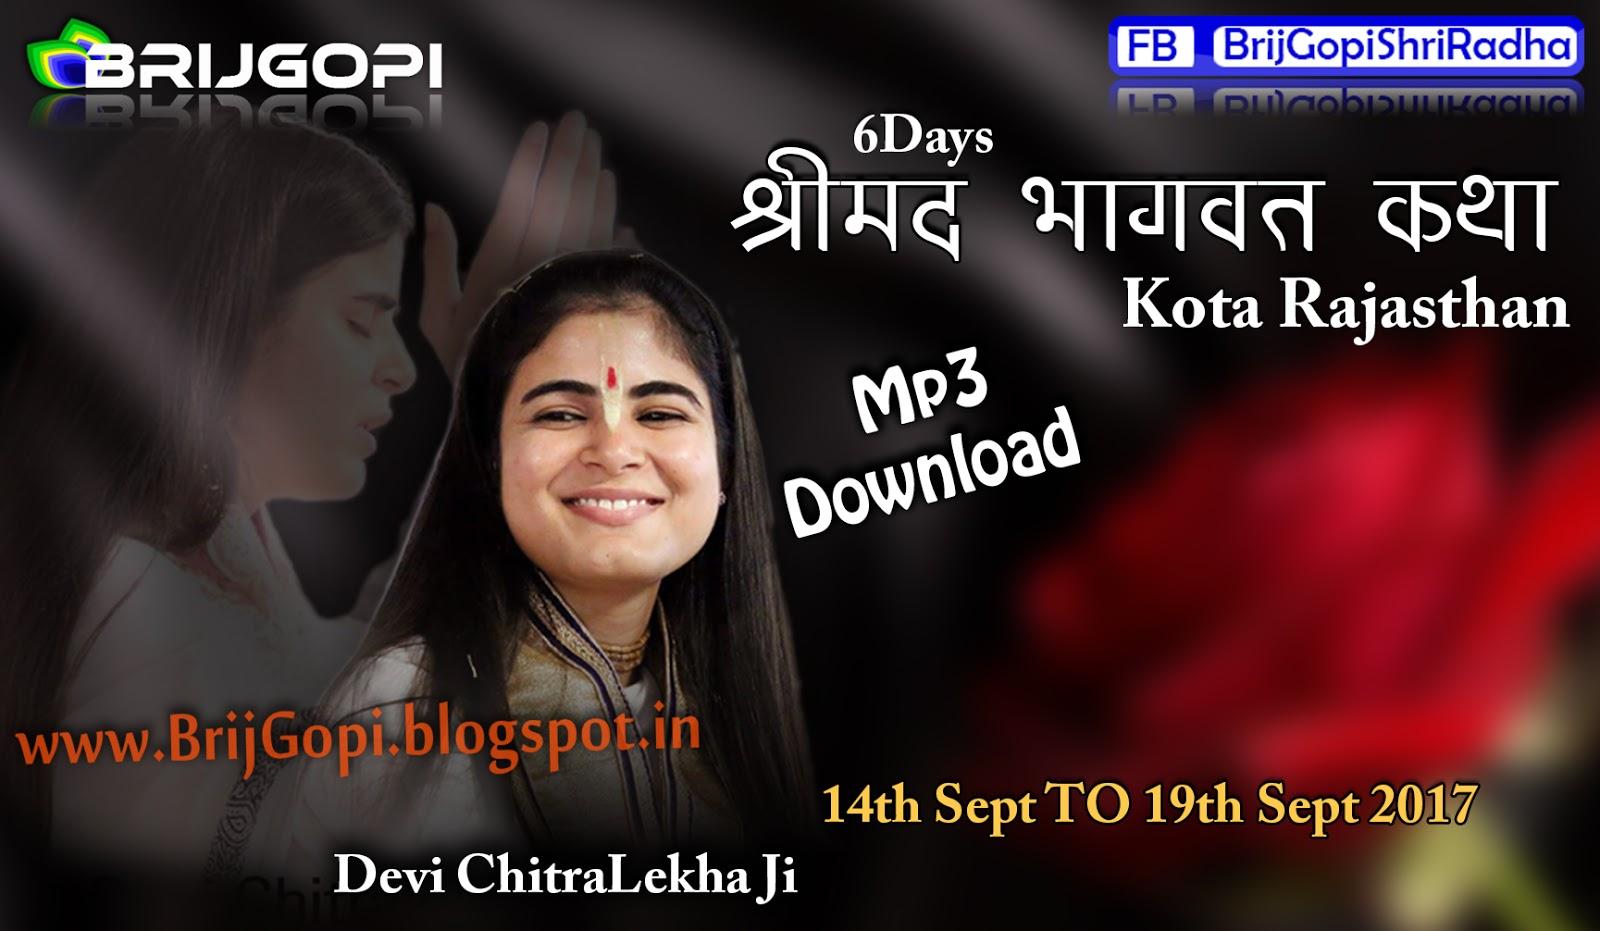 Shri Mad Bhagwat Katha [Full Download] Devi Chitralekha Ji] with pdf